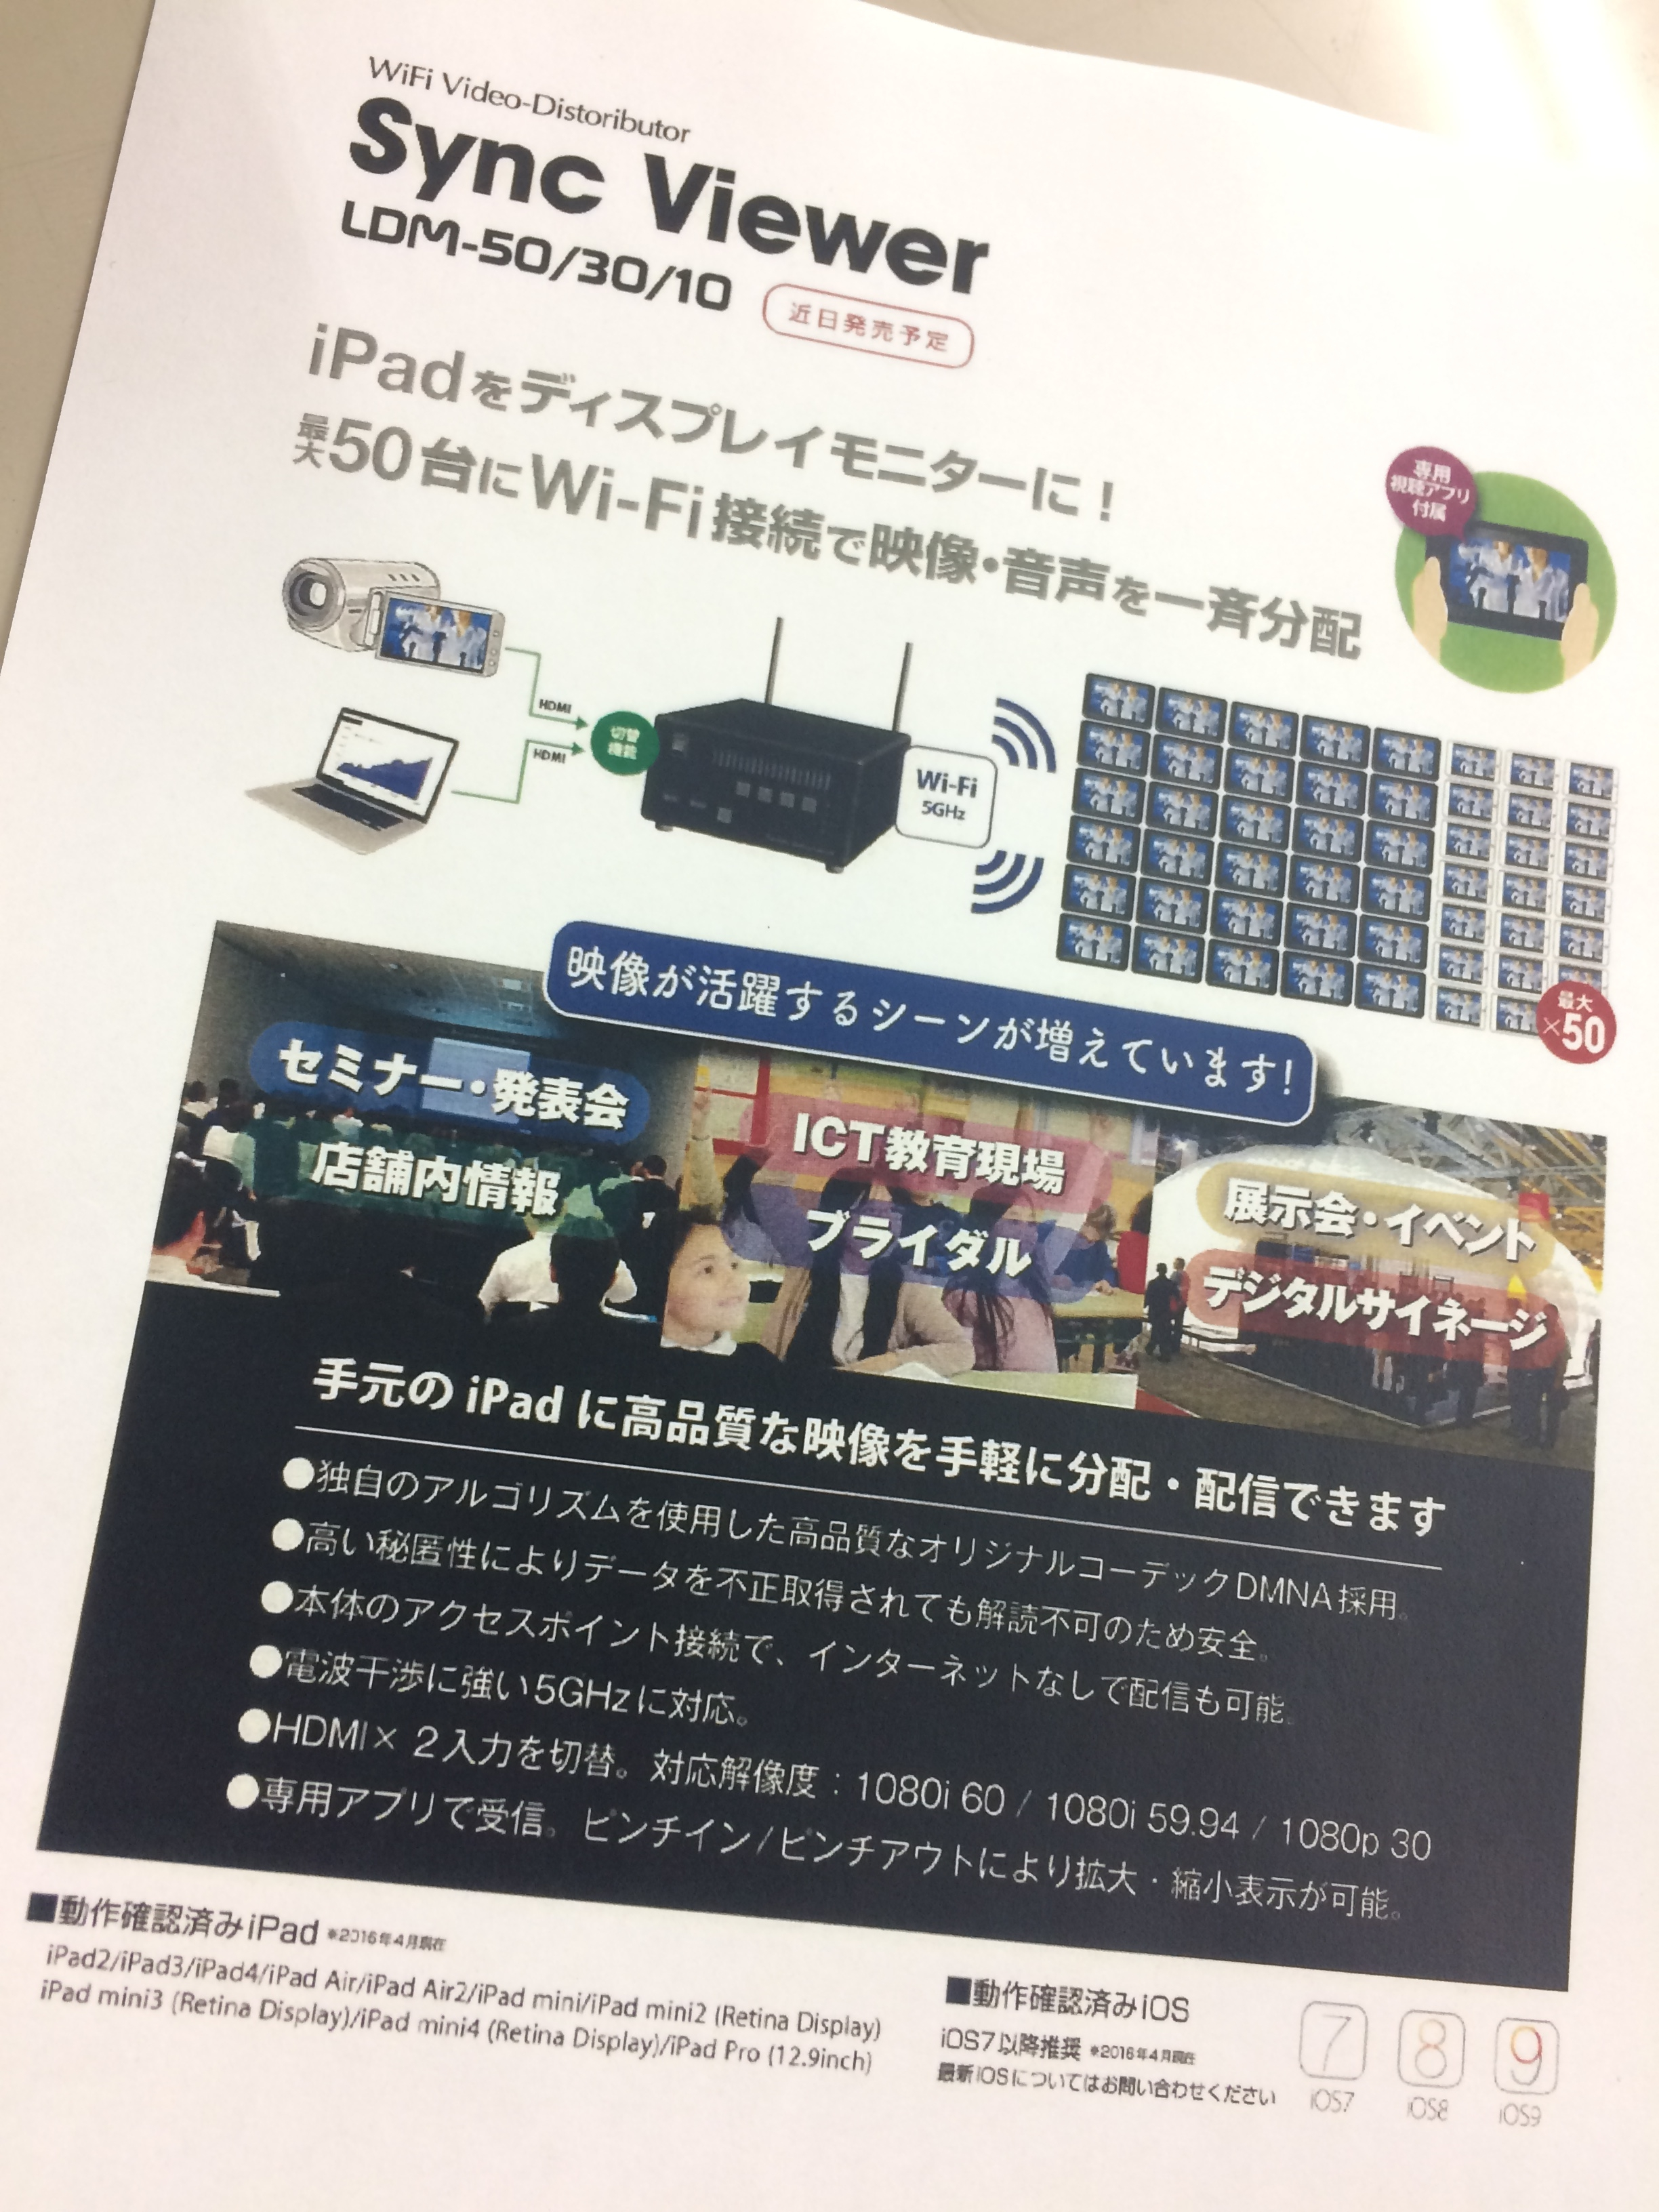 【WiFi Sync Viewer】